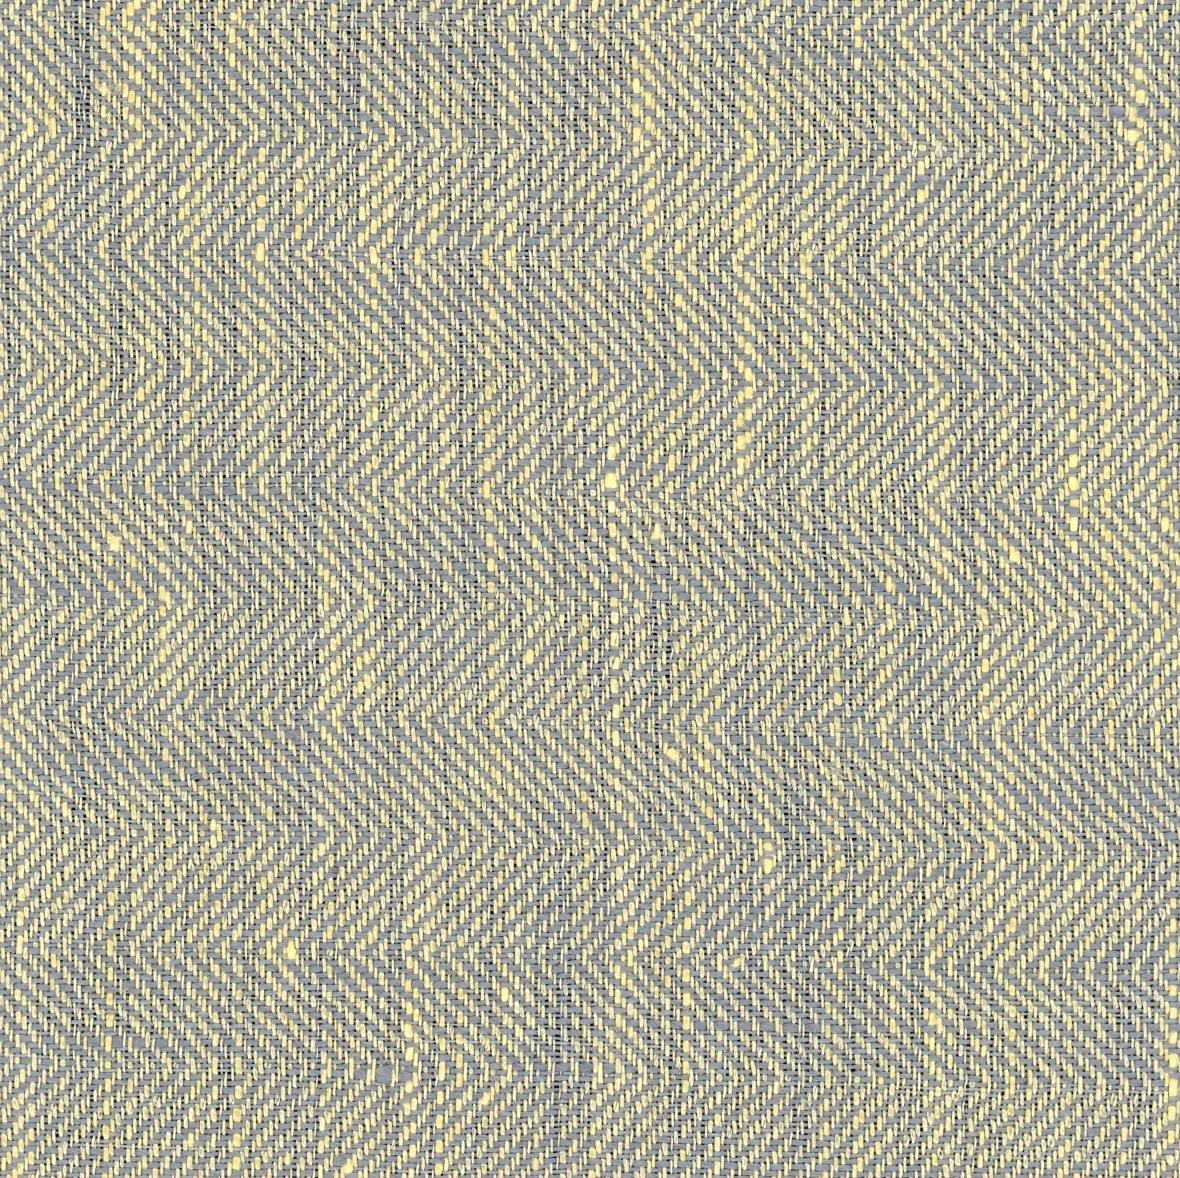 CERRO SPINA PESCE Grey-Blue Ivory